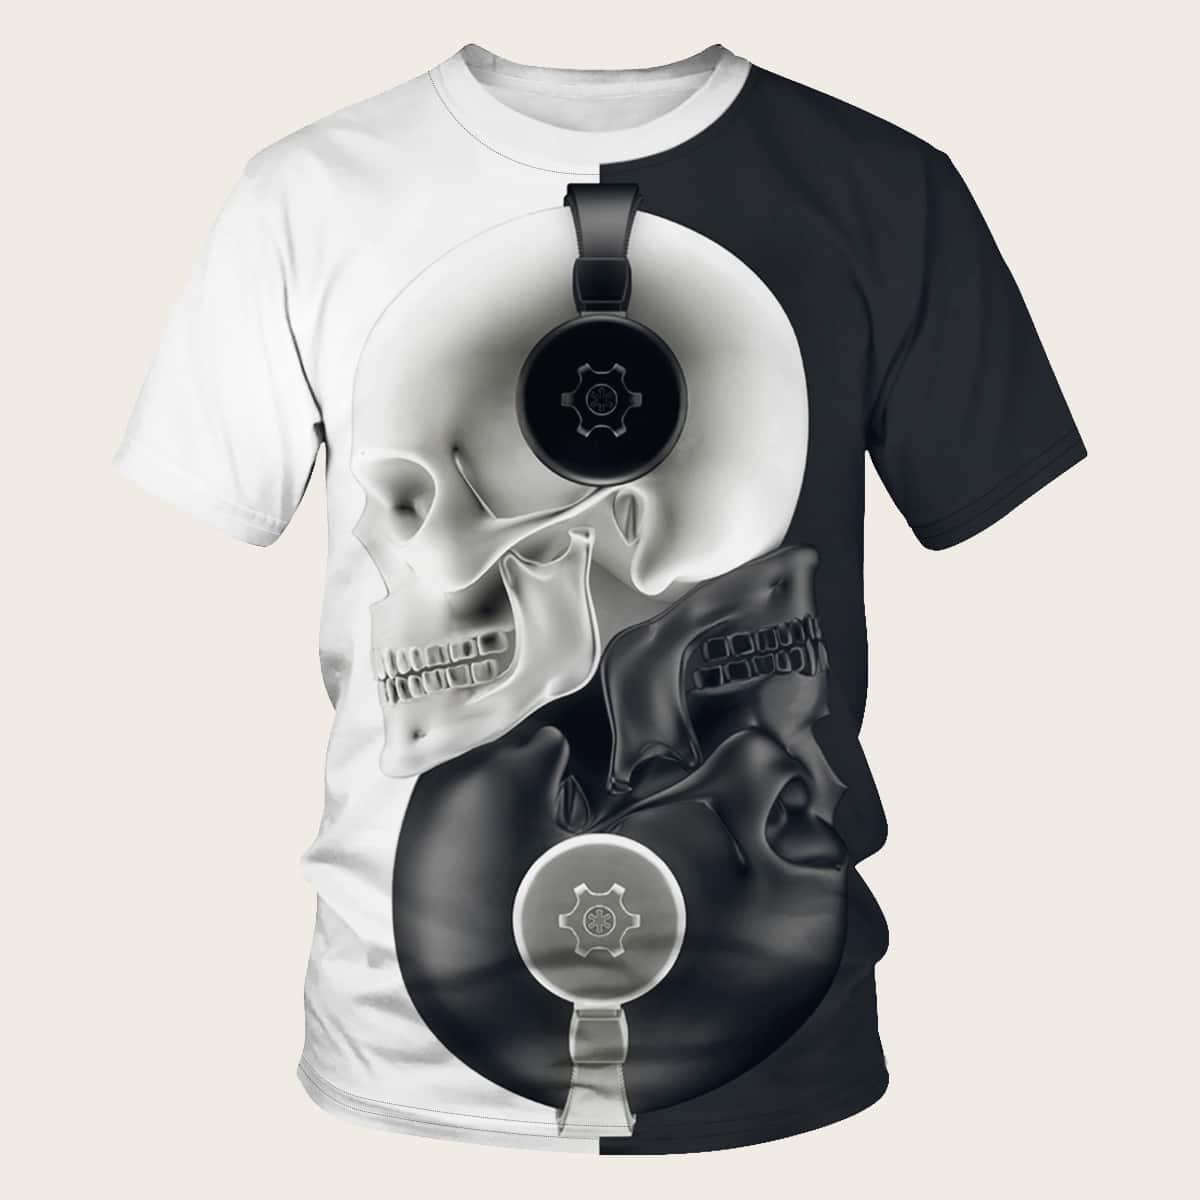 Zwart & wit Casual Shirts mannen